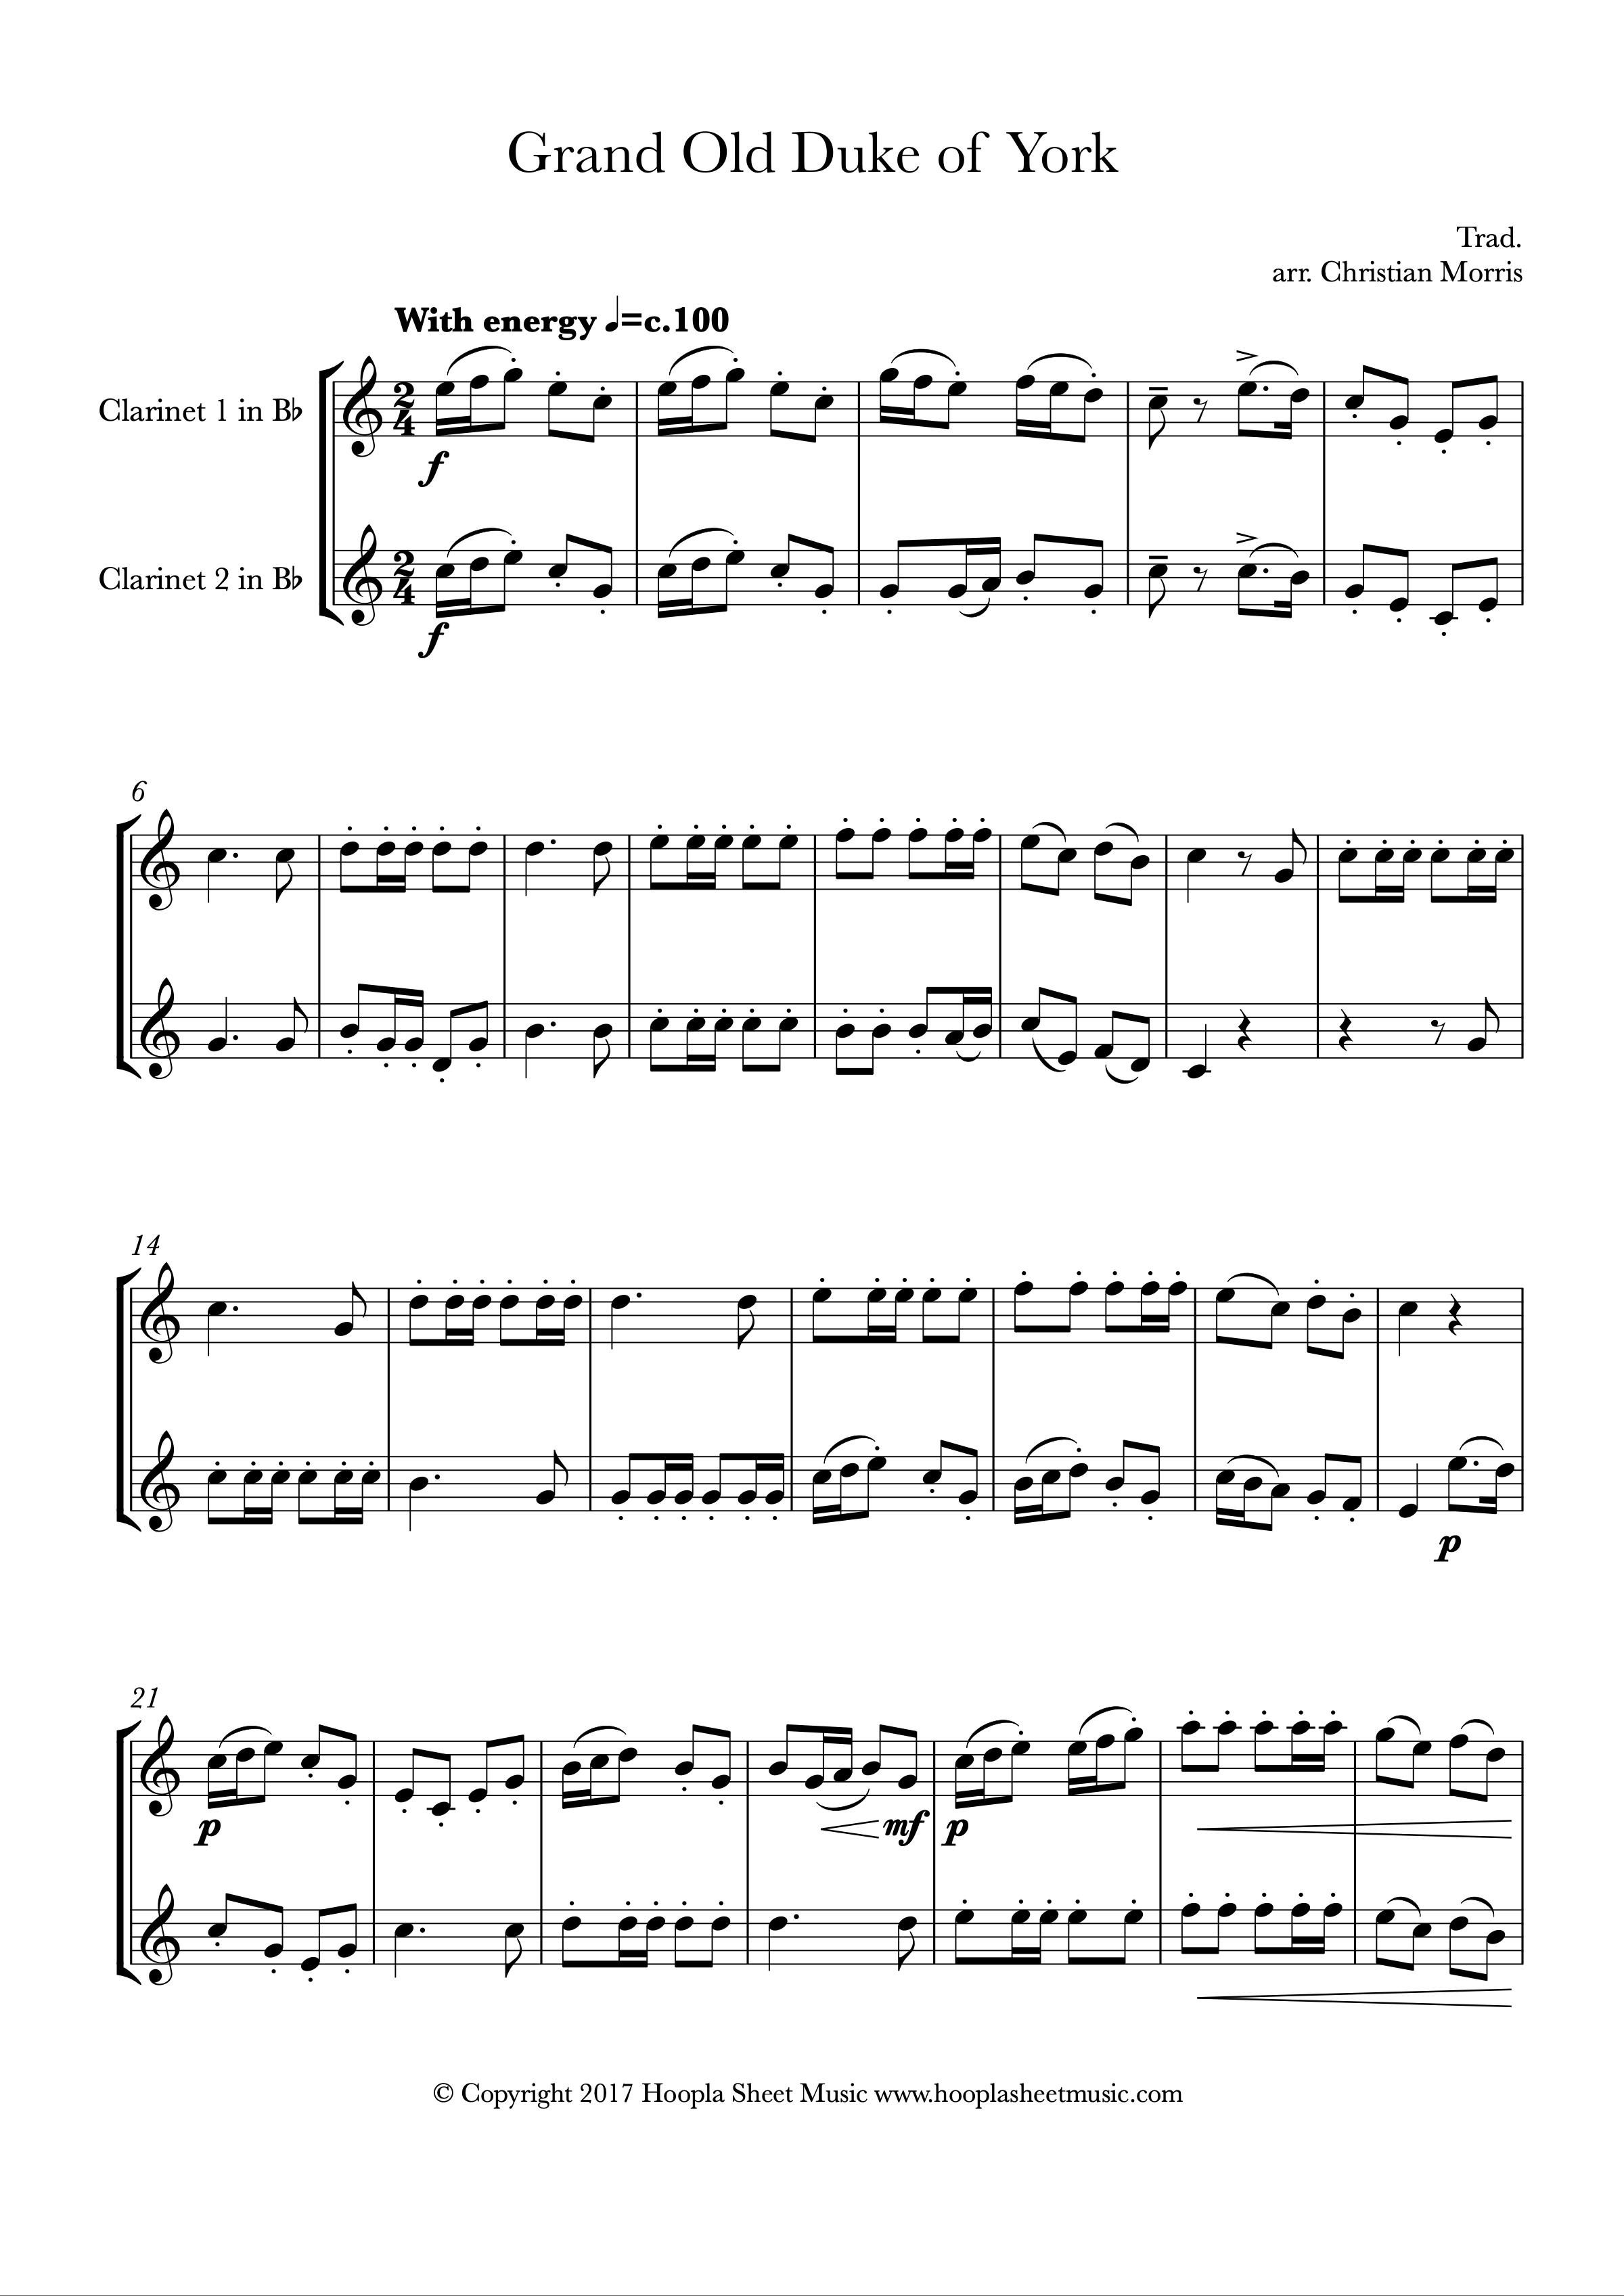 The Grand Old Duke of York (Clarinet Duet)